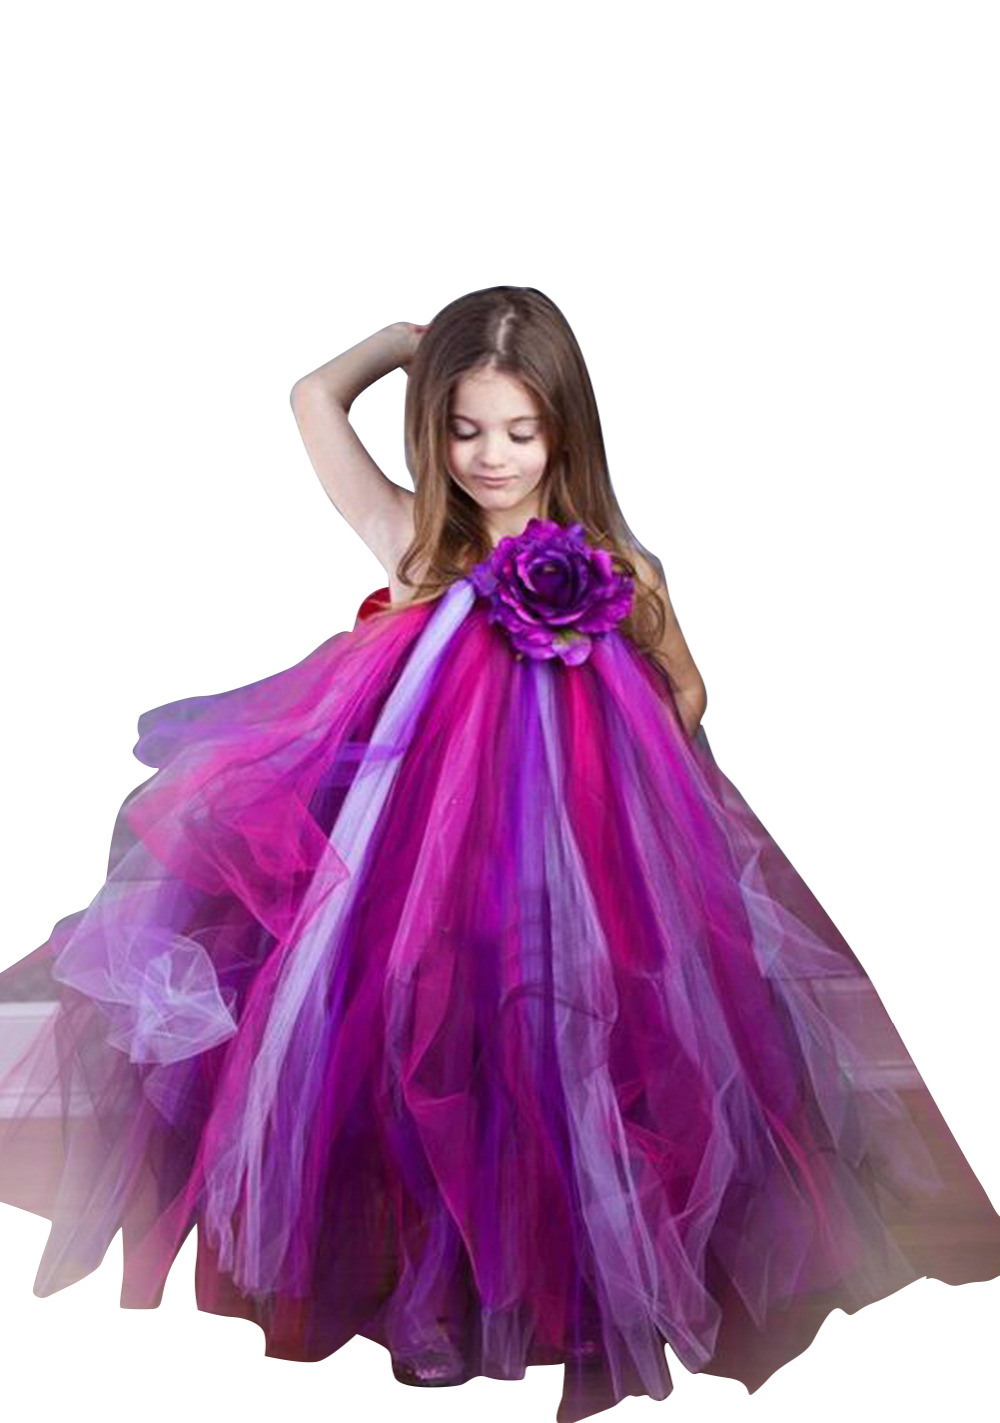 Vistoso Vestido De Fiesta Corto De Pavo Real Ideas Ornamento ...